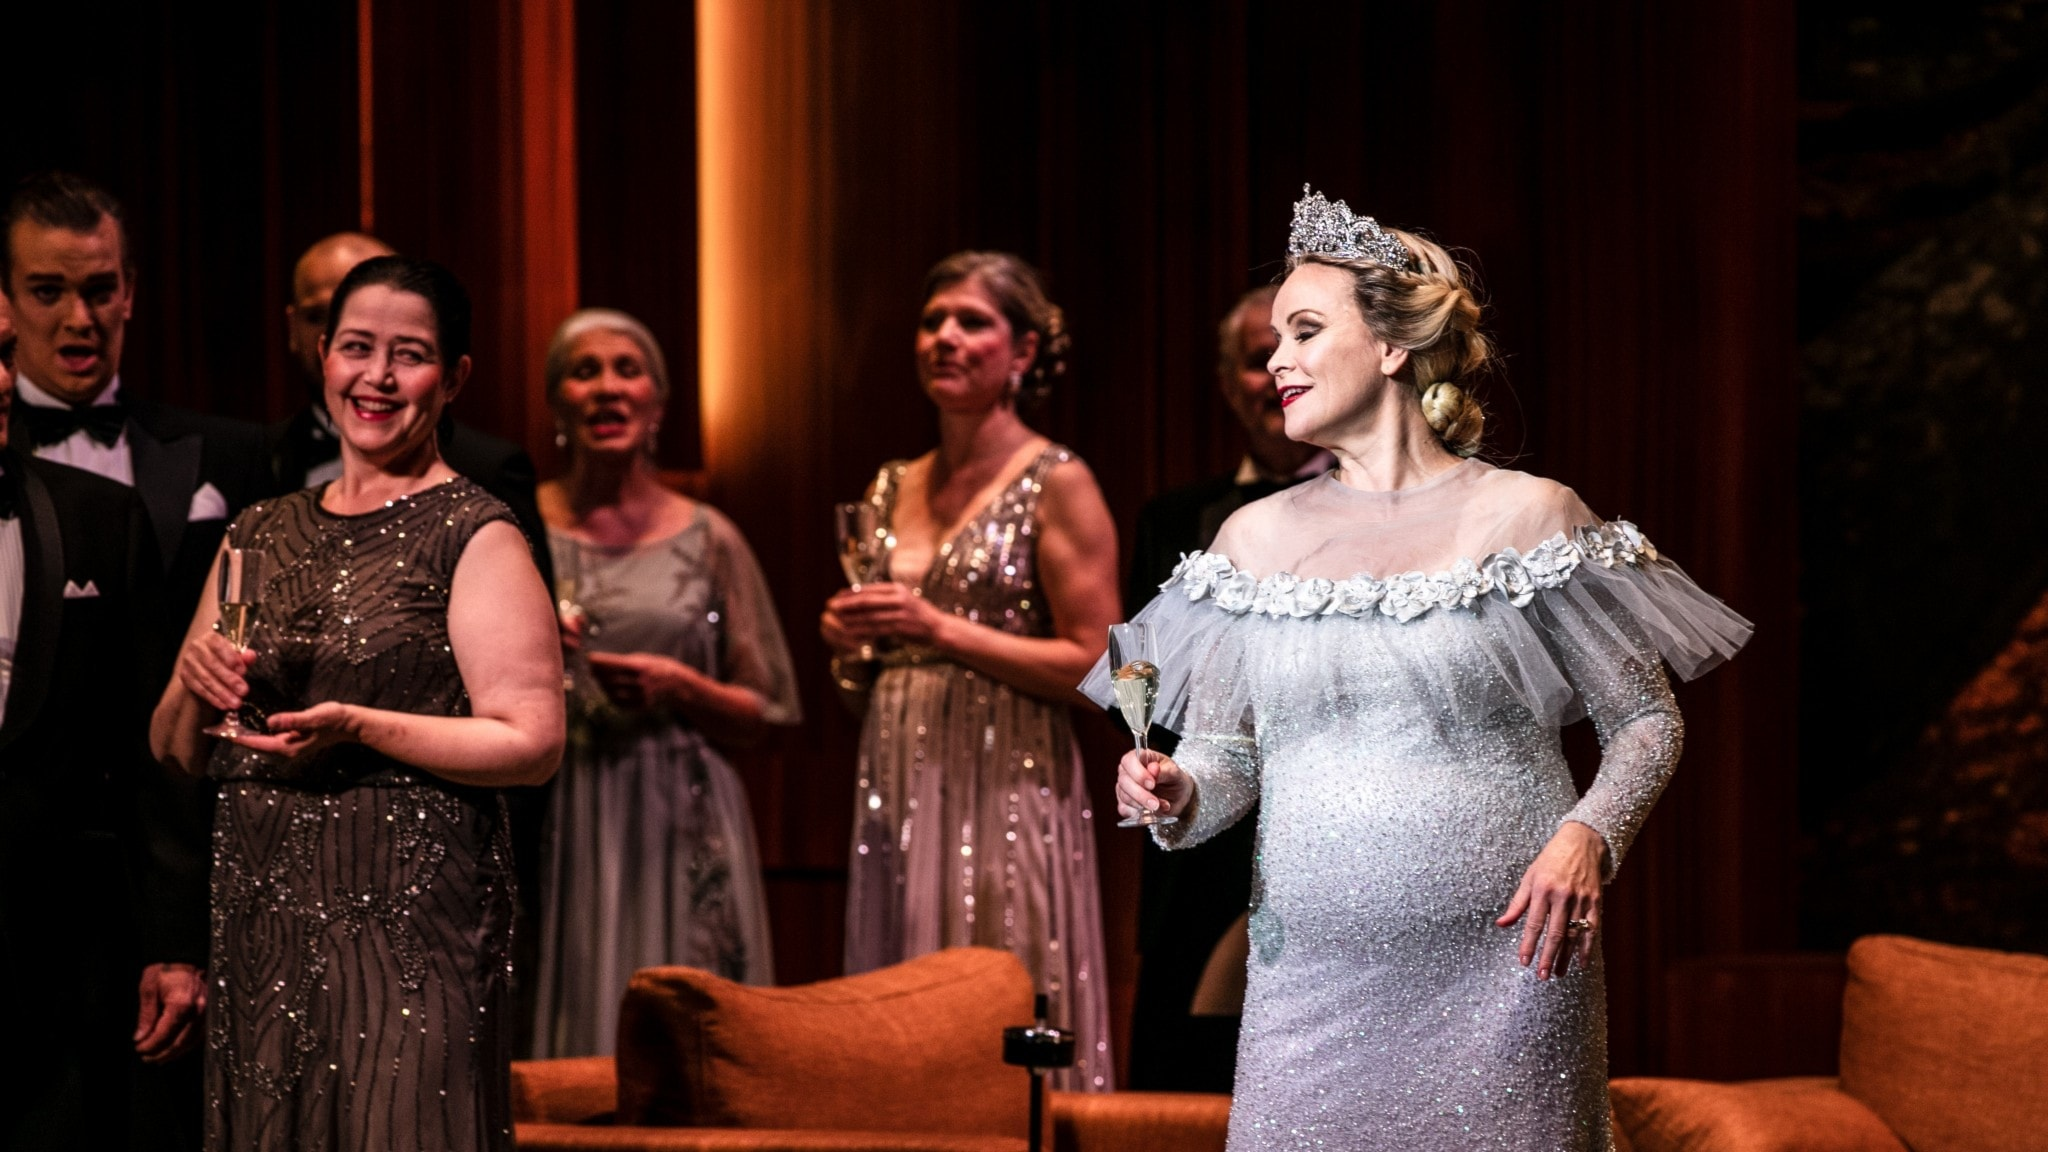 Bild: Hege Gustava Tjønn i rollen som Lady Macbeth.